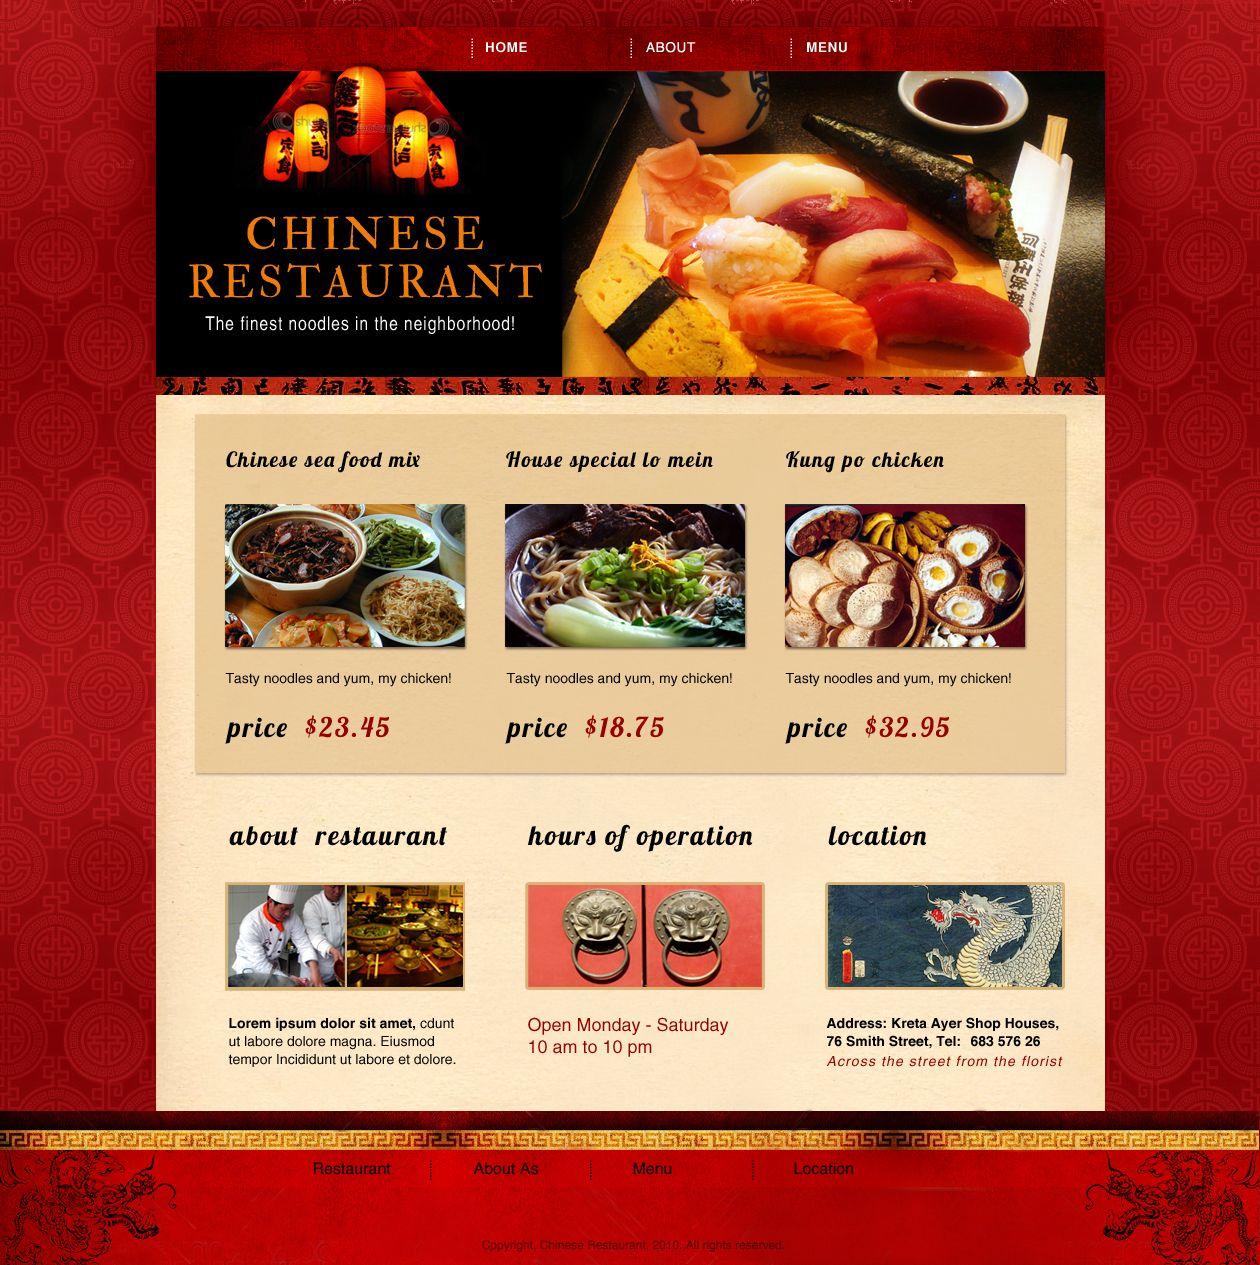 Chinese Restaurant Website Template Website Design 26 By Eris32 Restaurant Website Templates Restaurant Website Chinese Restaurant